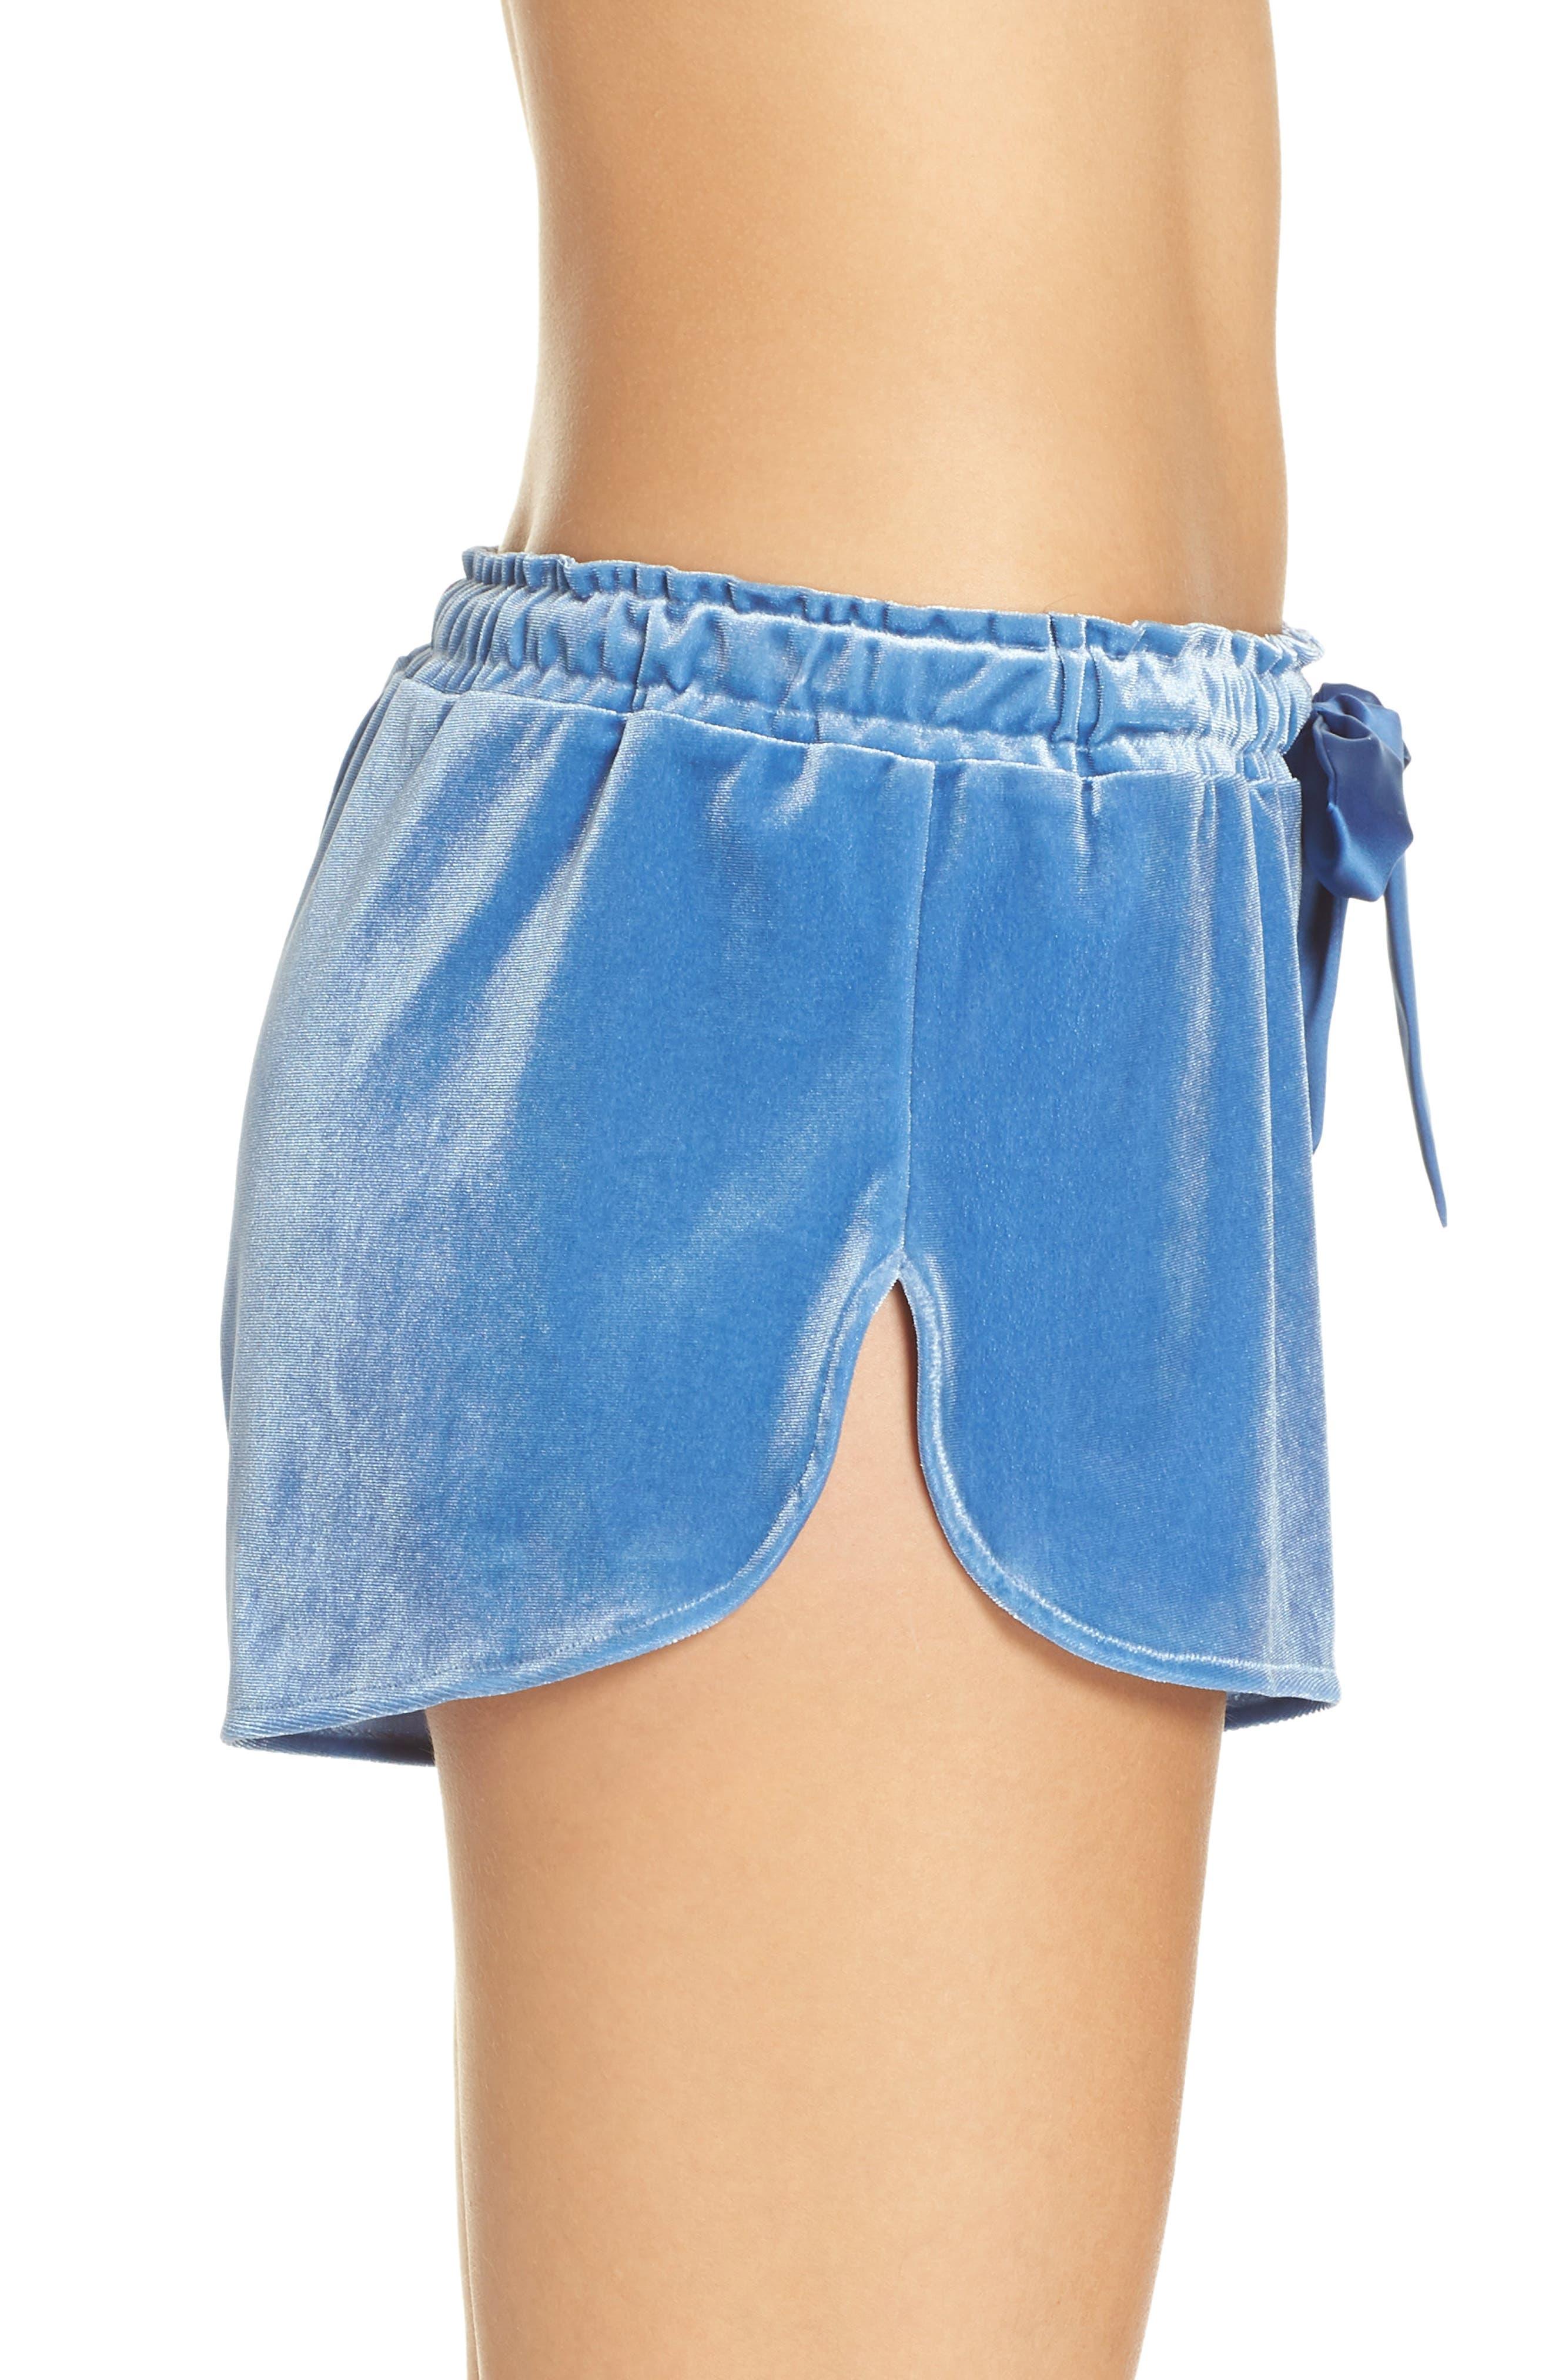 Starry Night Velvet Pajama Shorts,                             Alternate thumbnail 3, color,                             BLUE DELFT